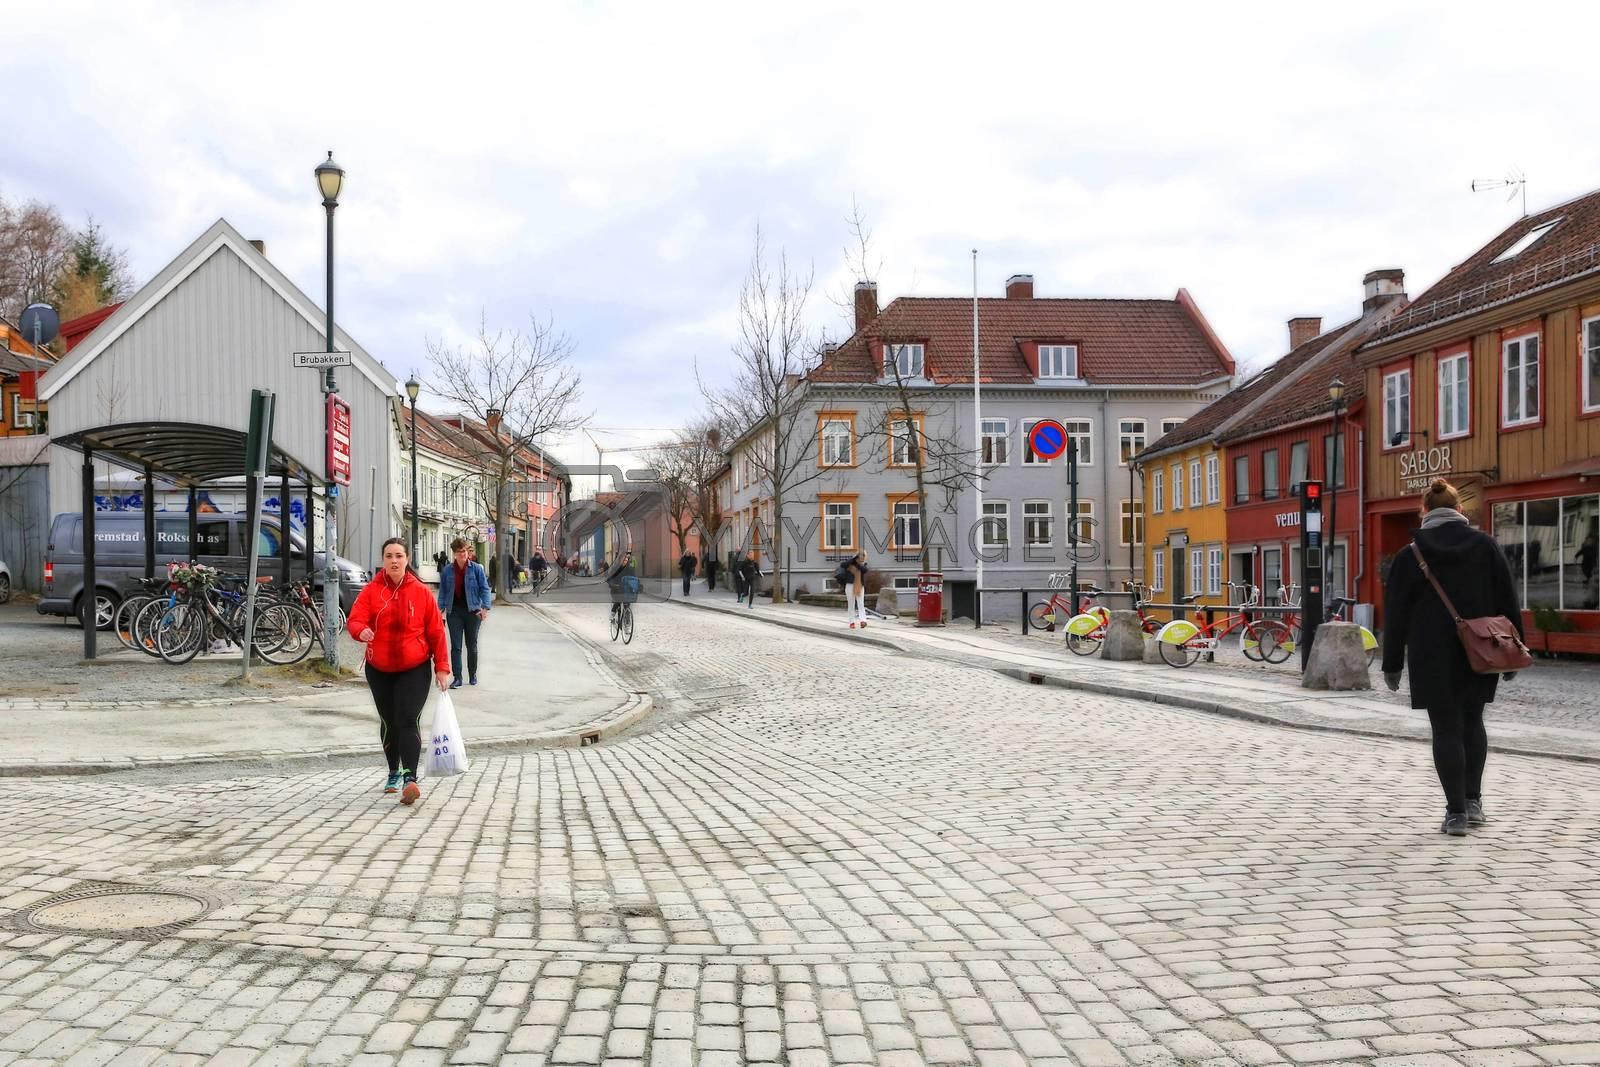 Rundtur i Trondheim en vårdag - Gate på Bakklandet